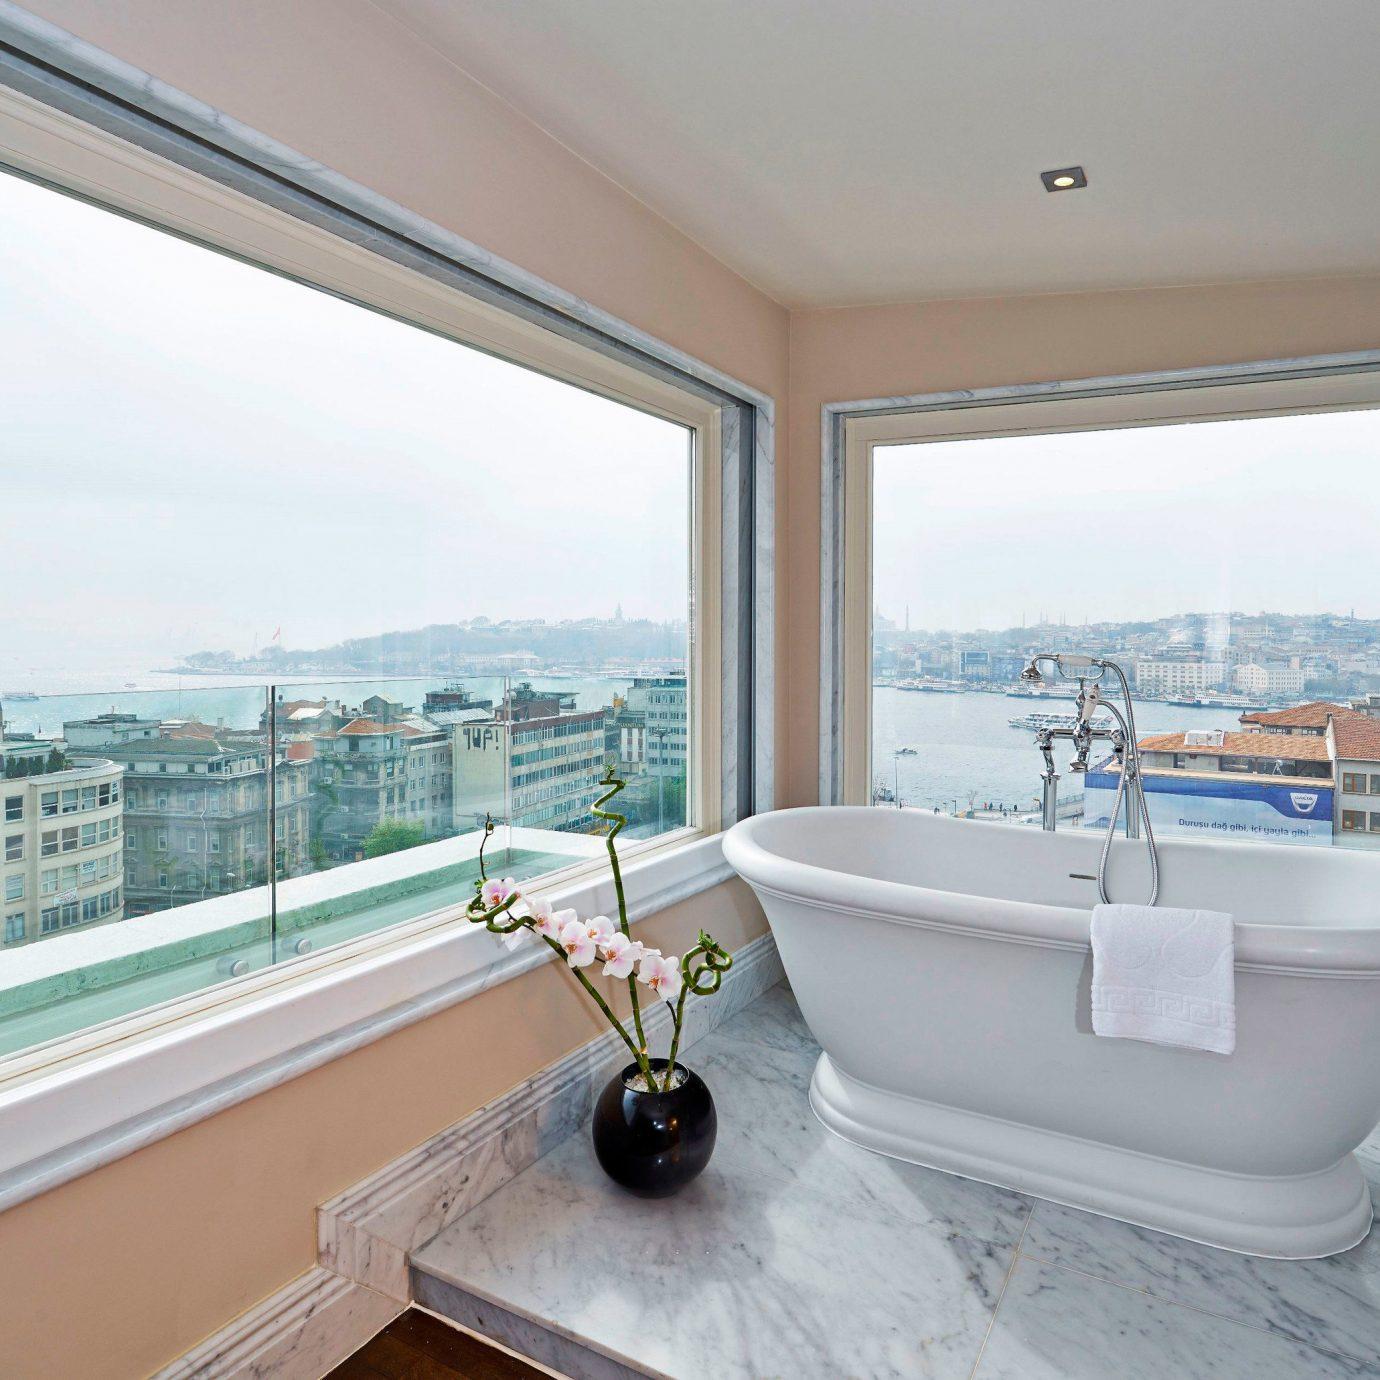 Boutique Hotels Hotels Luxury Travel property swimming pool home condominium bathtub bathroom Villa daylighting Suite tub